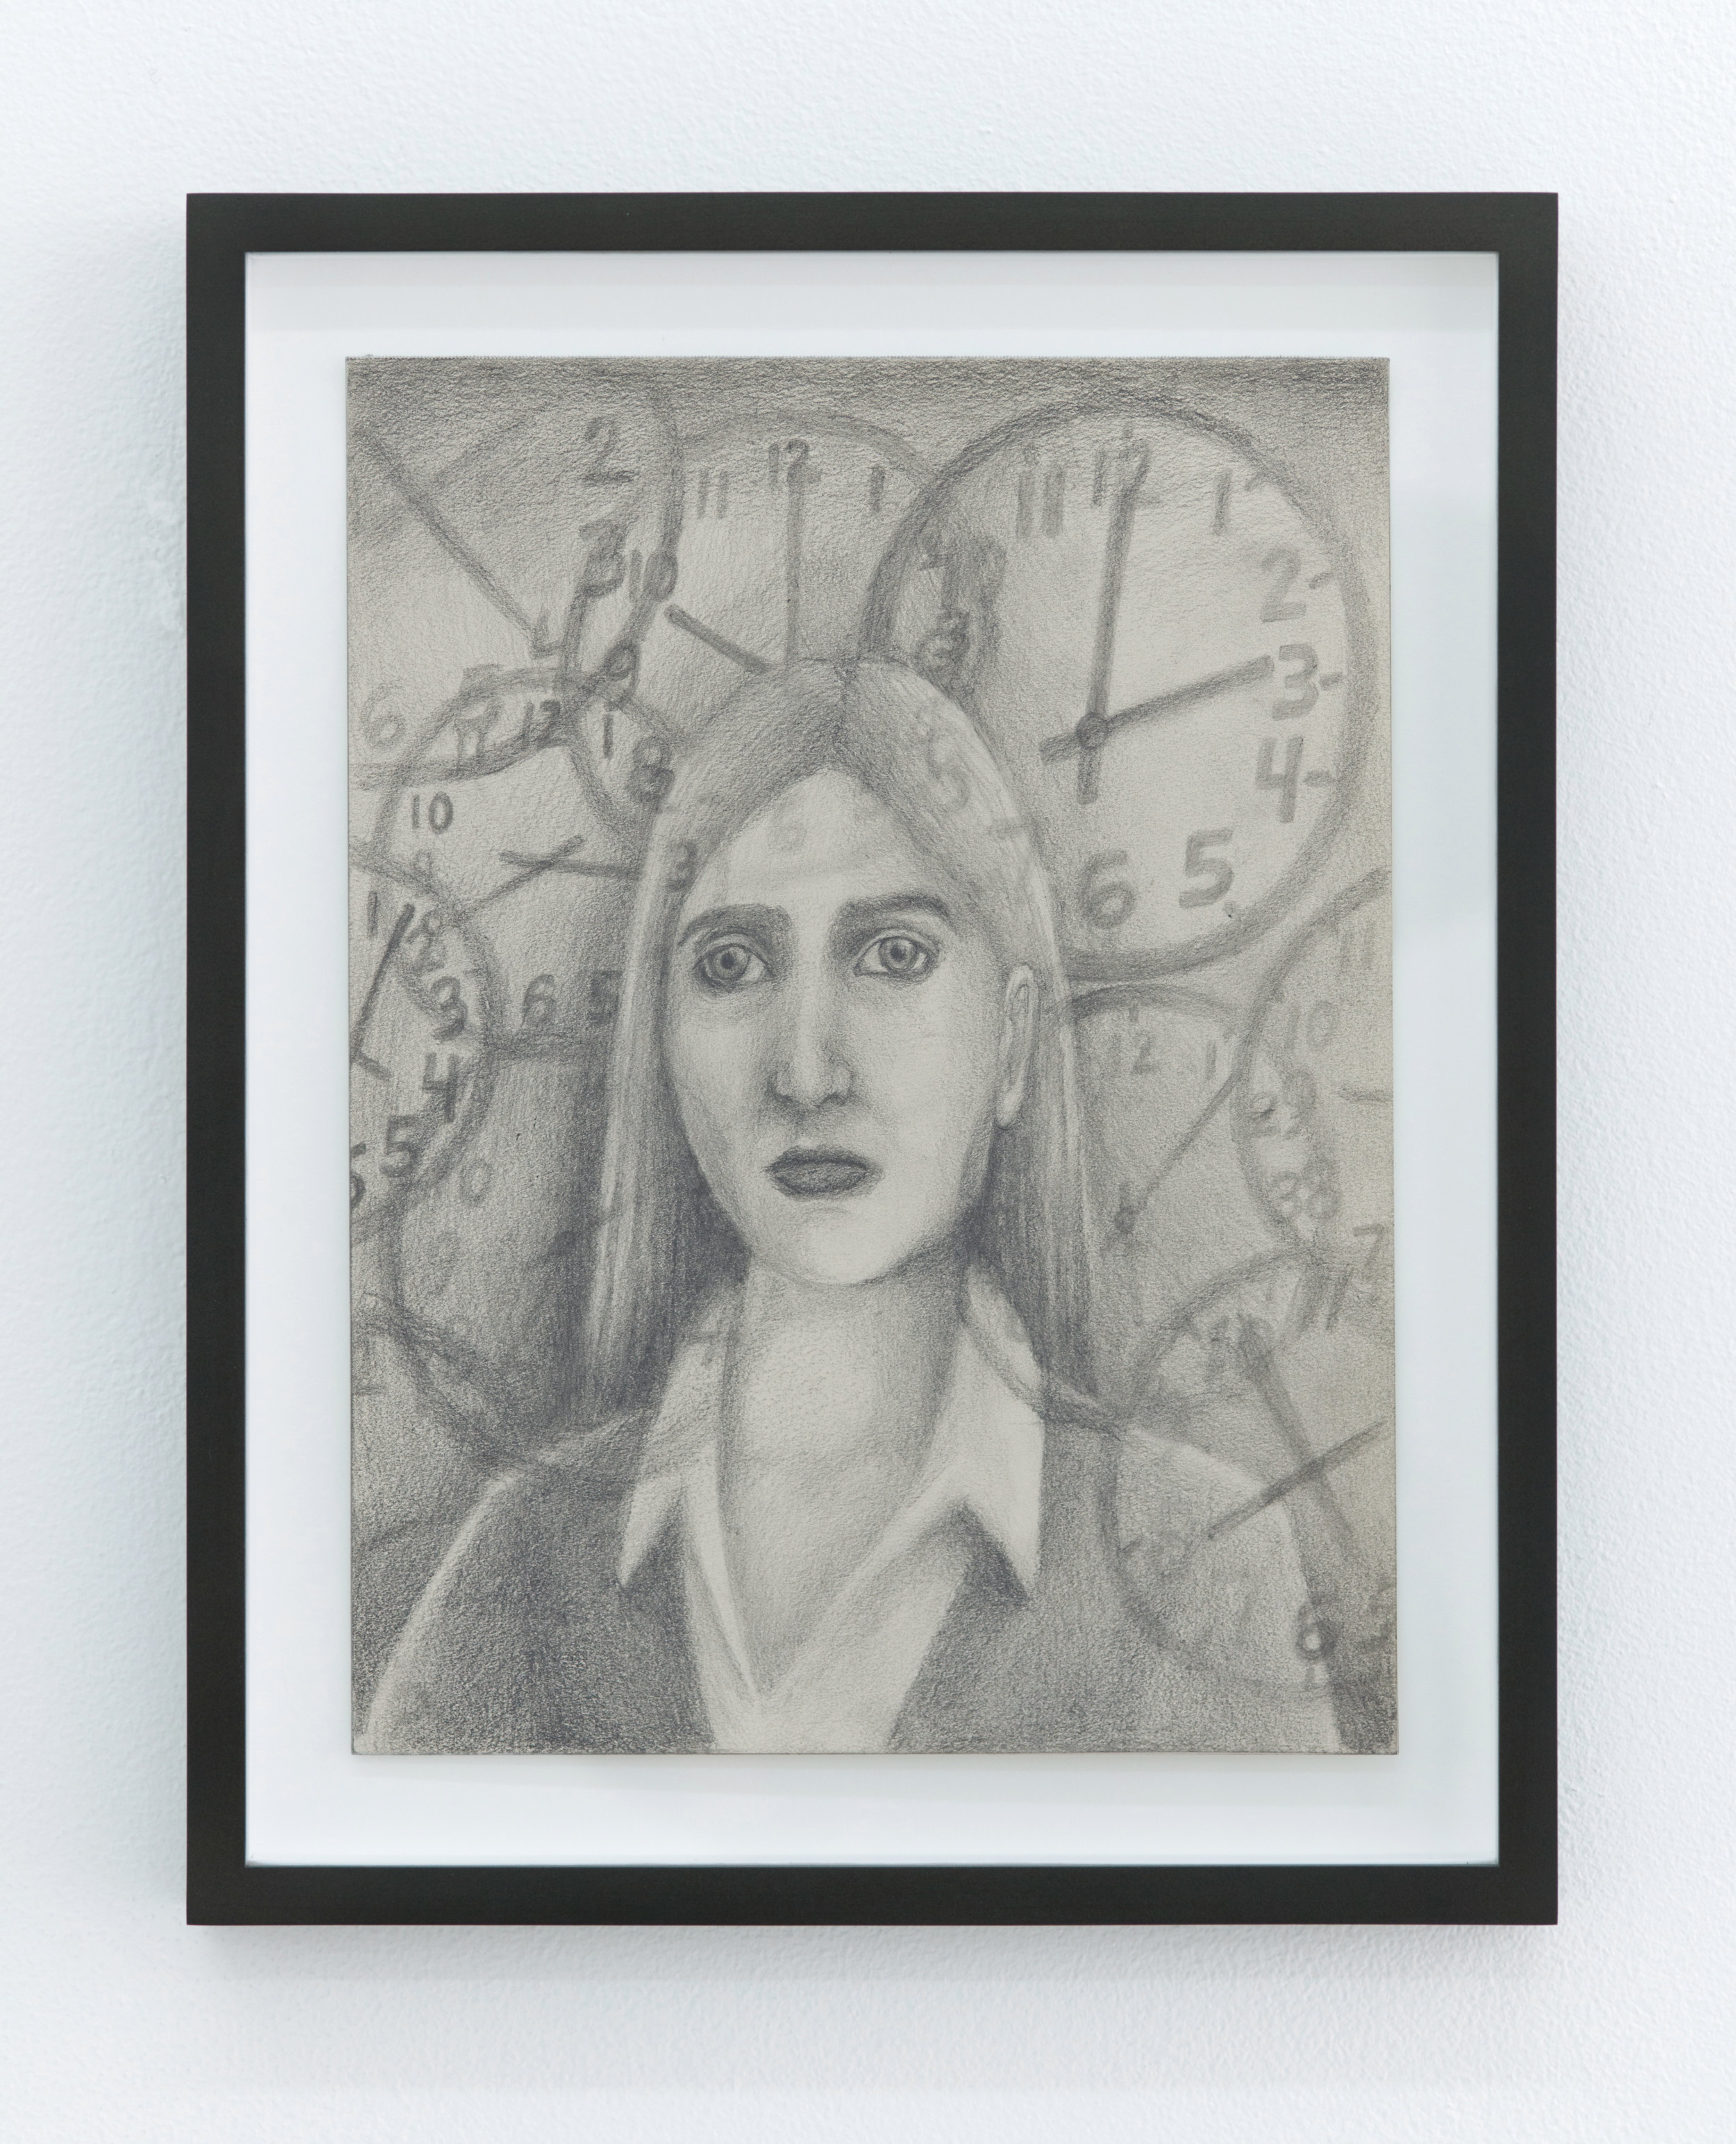 Vanessa Gully Santiago   Clock Watcher,  2018 Graphite on paper 10 x 8 inches